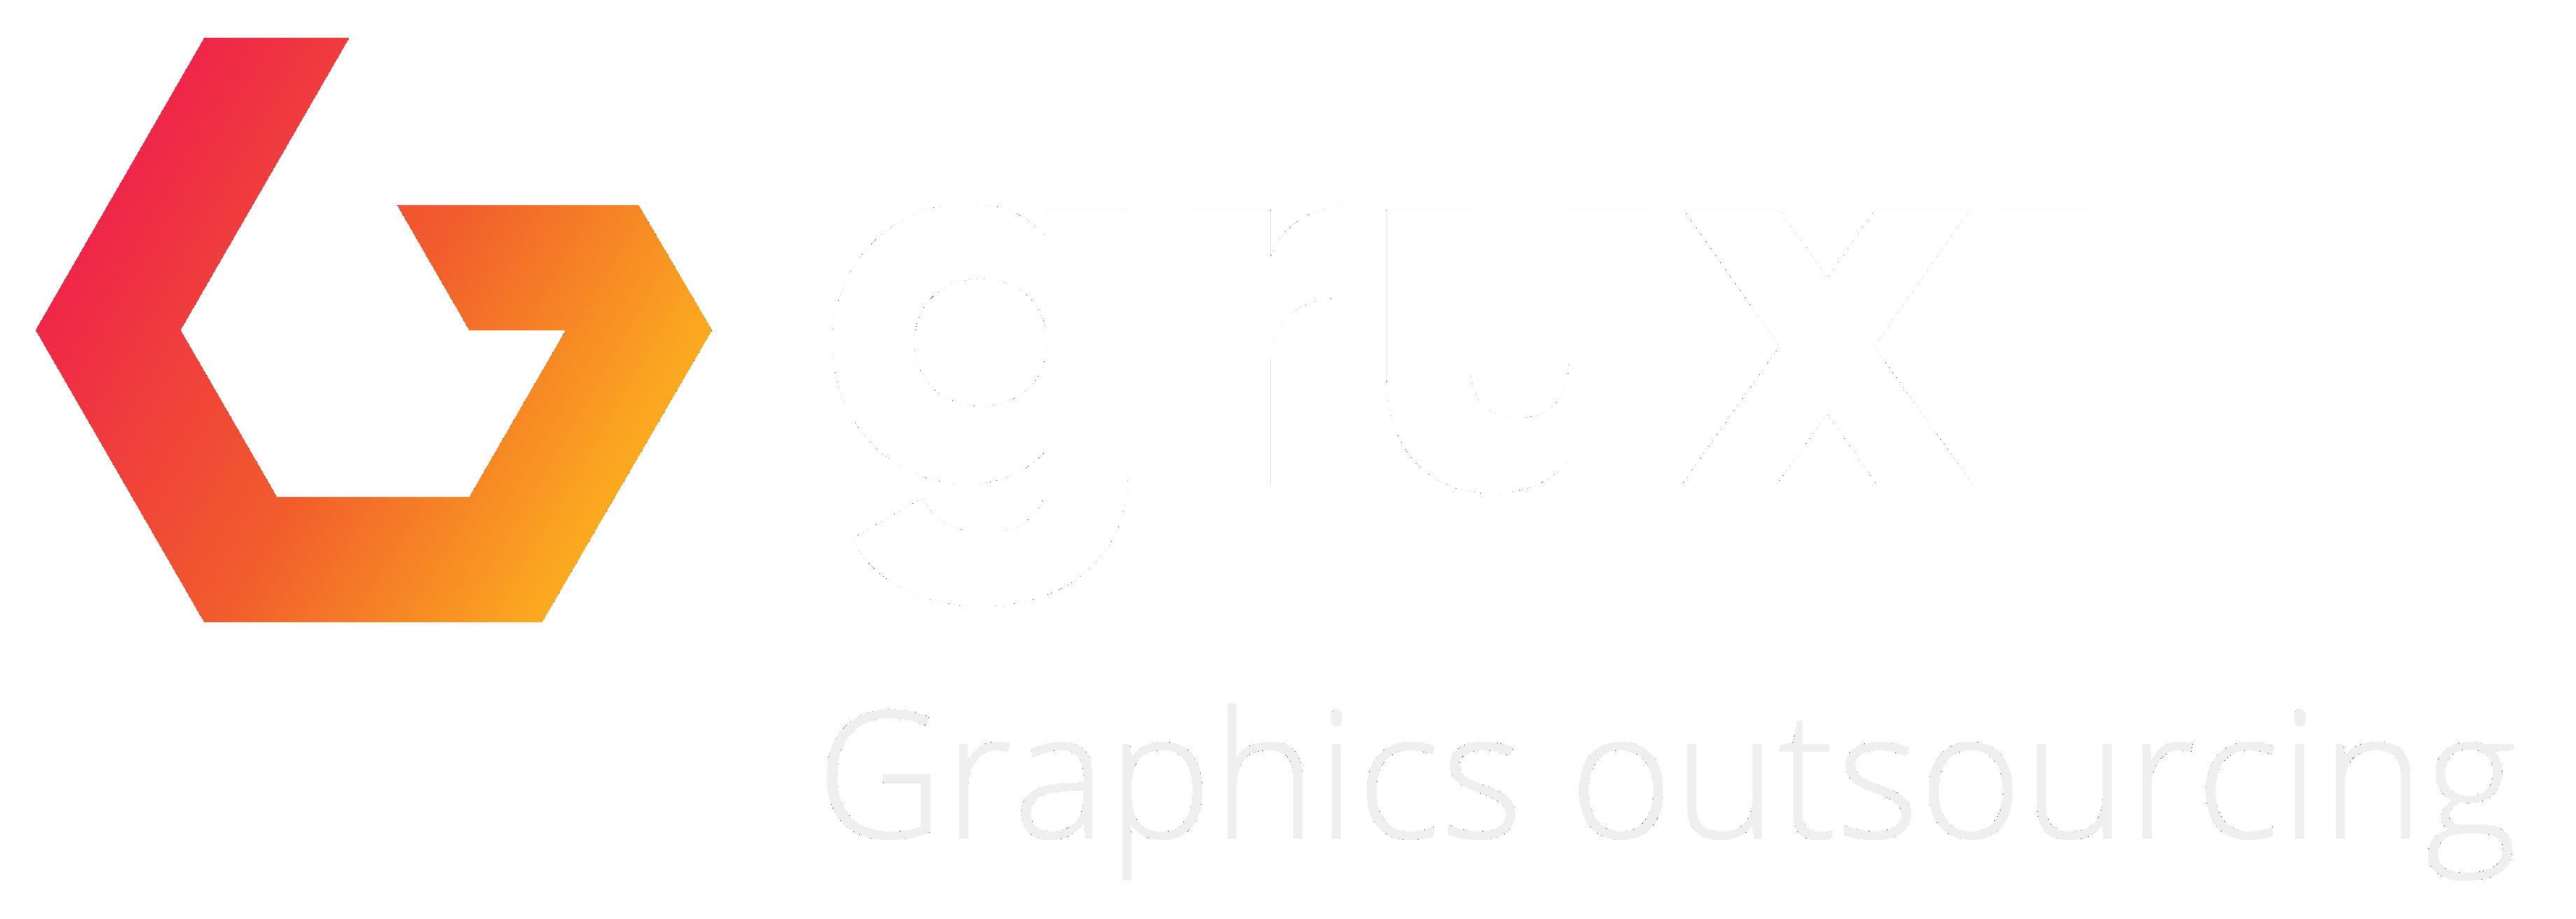 Gruxi